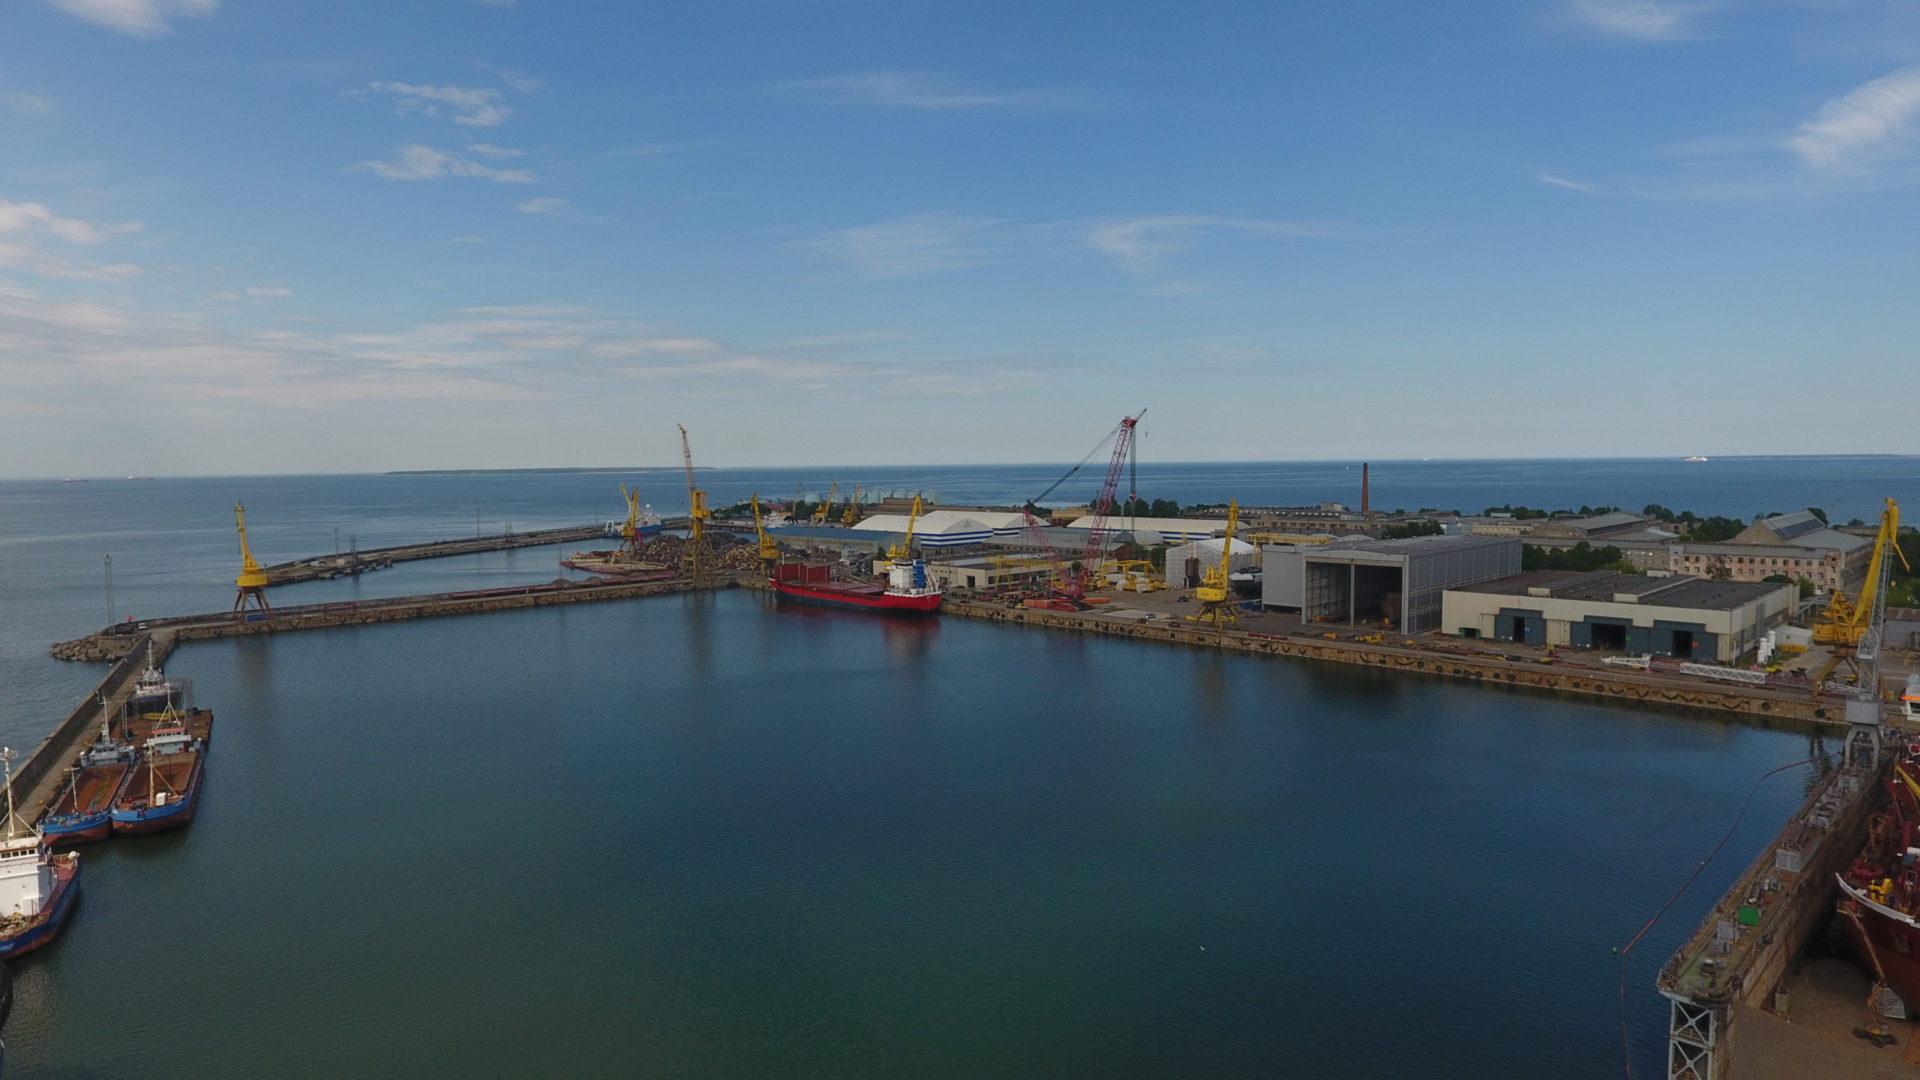 Piers 9-15 of the BLRT Shipyard, Tallinn, Estonia